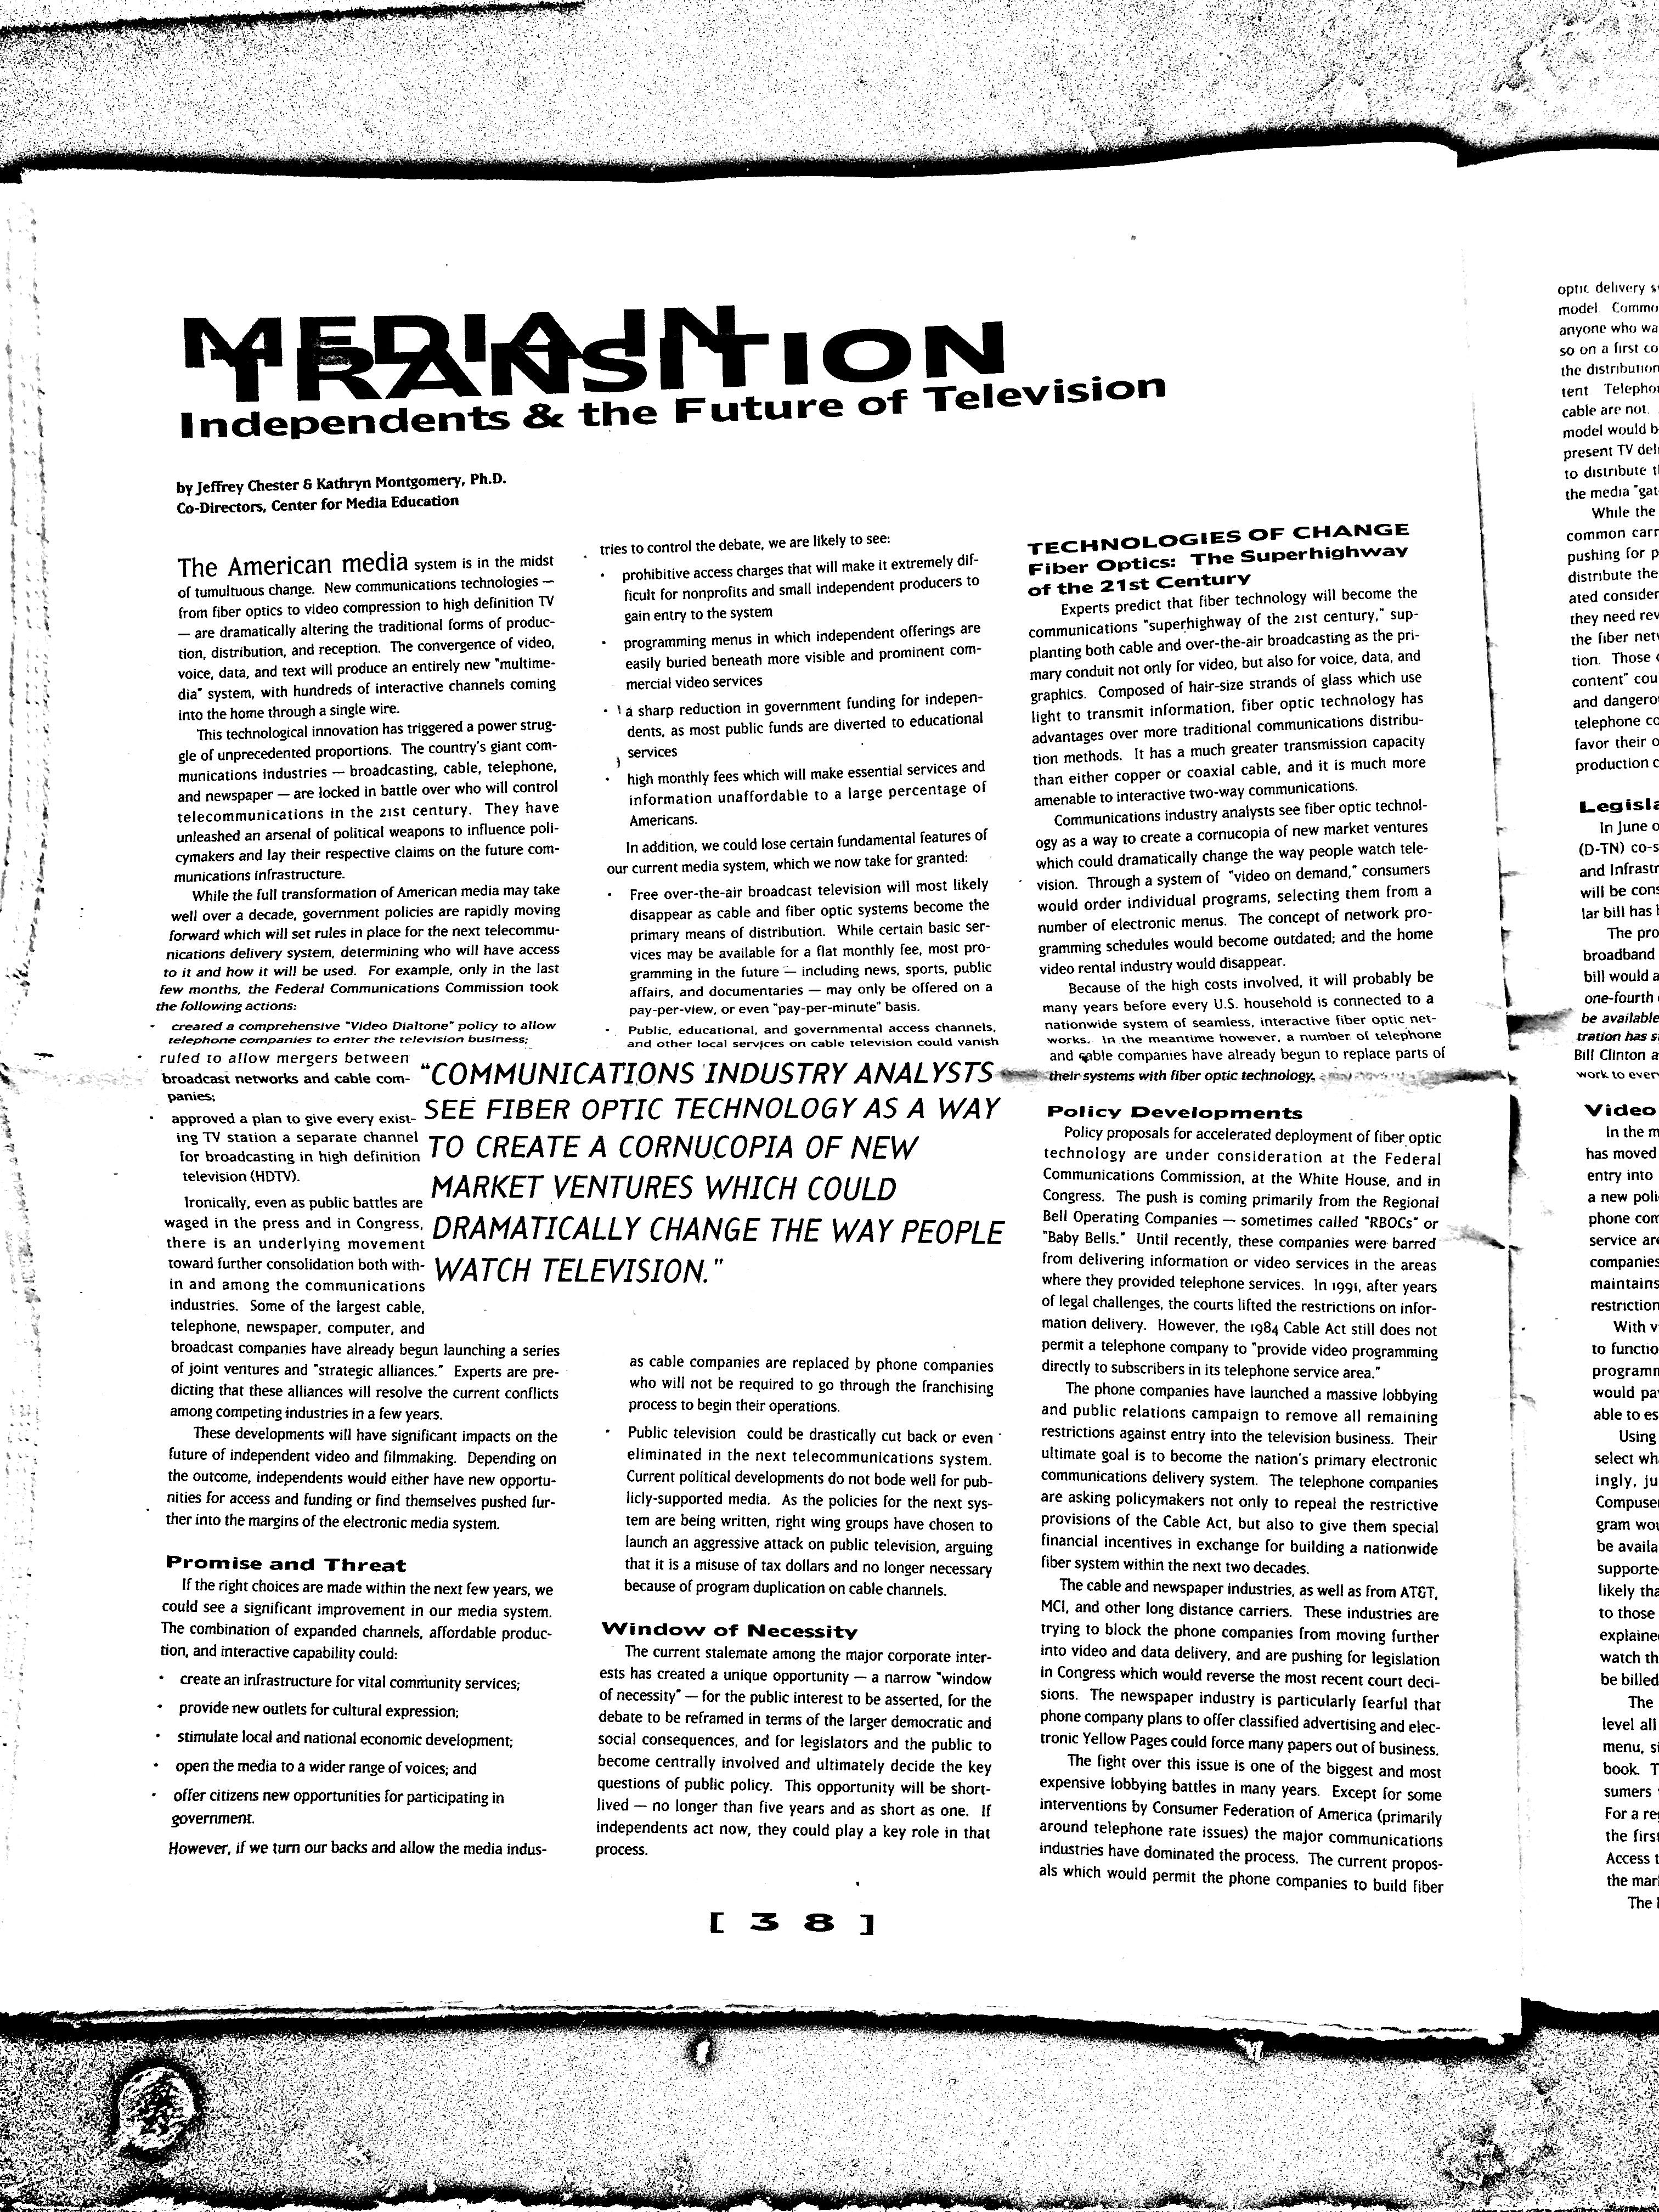 April 1993 - NAAO Bulletin Page 38.jpg